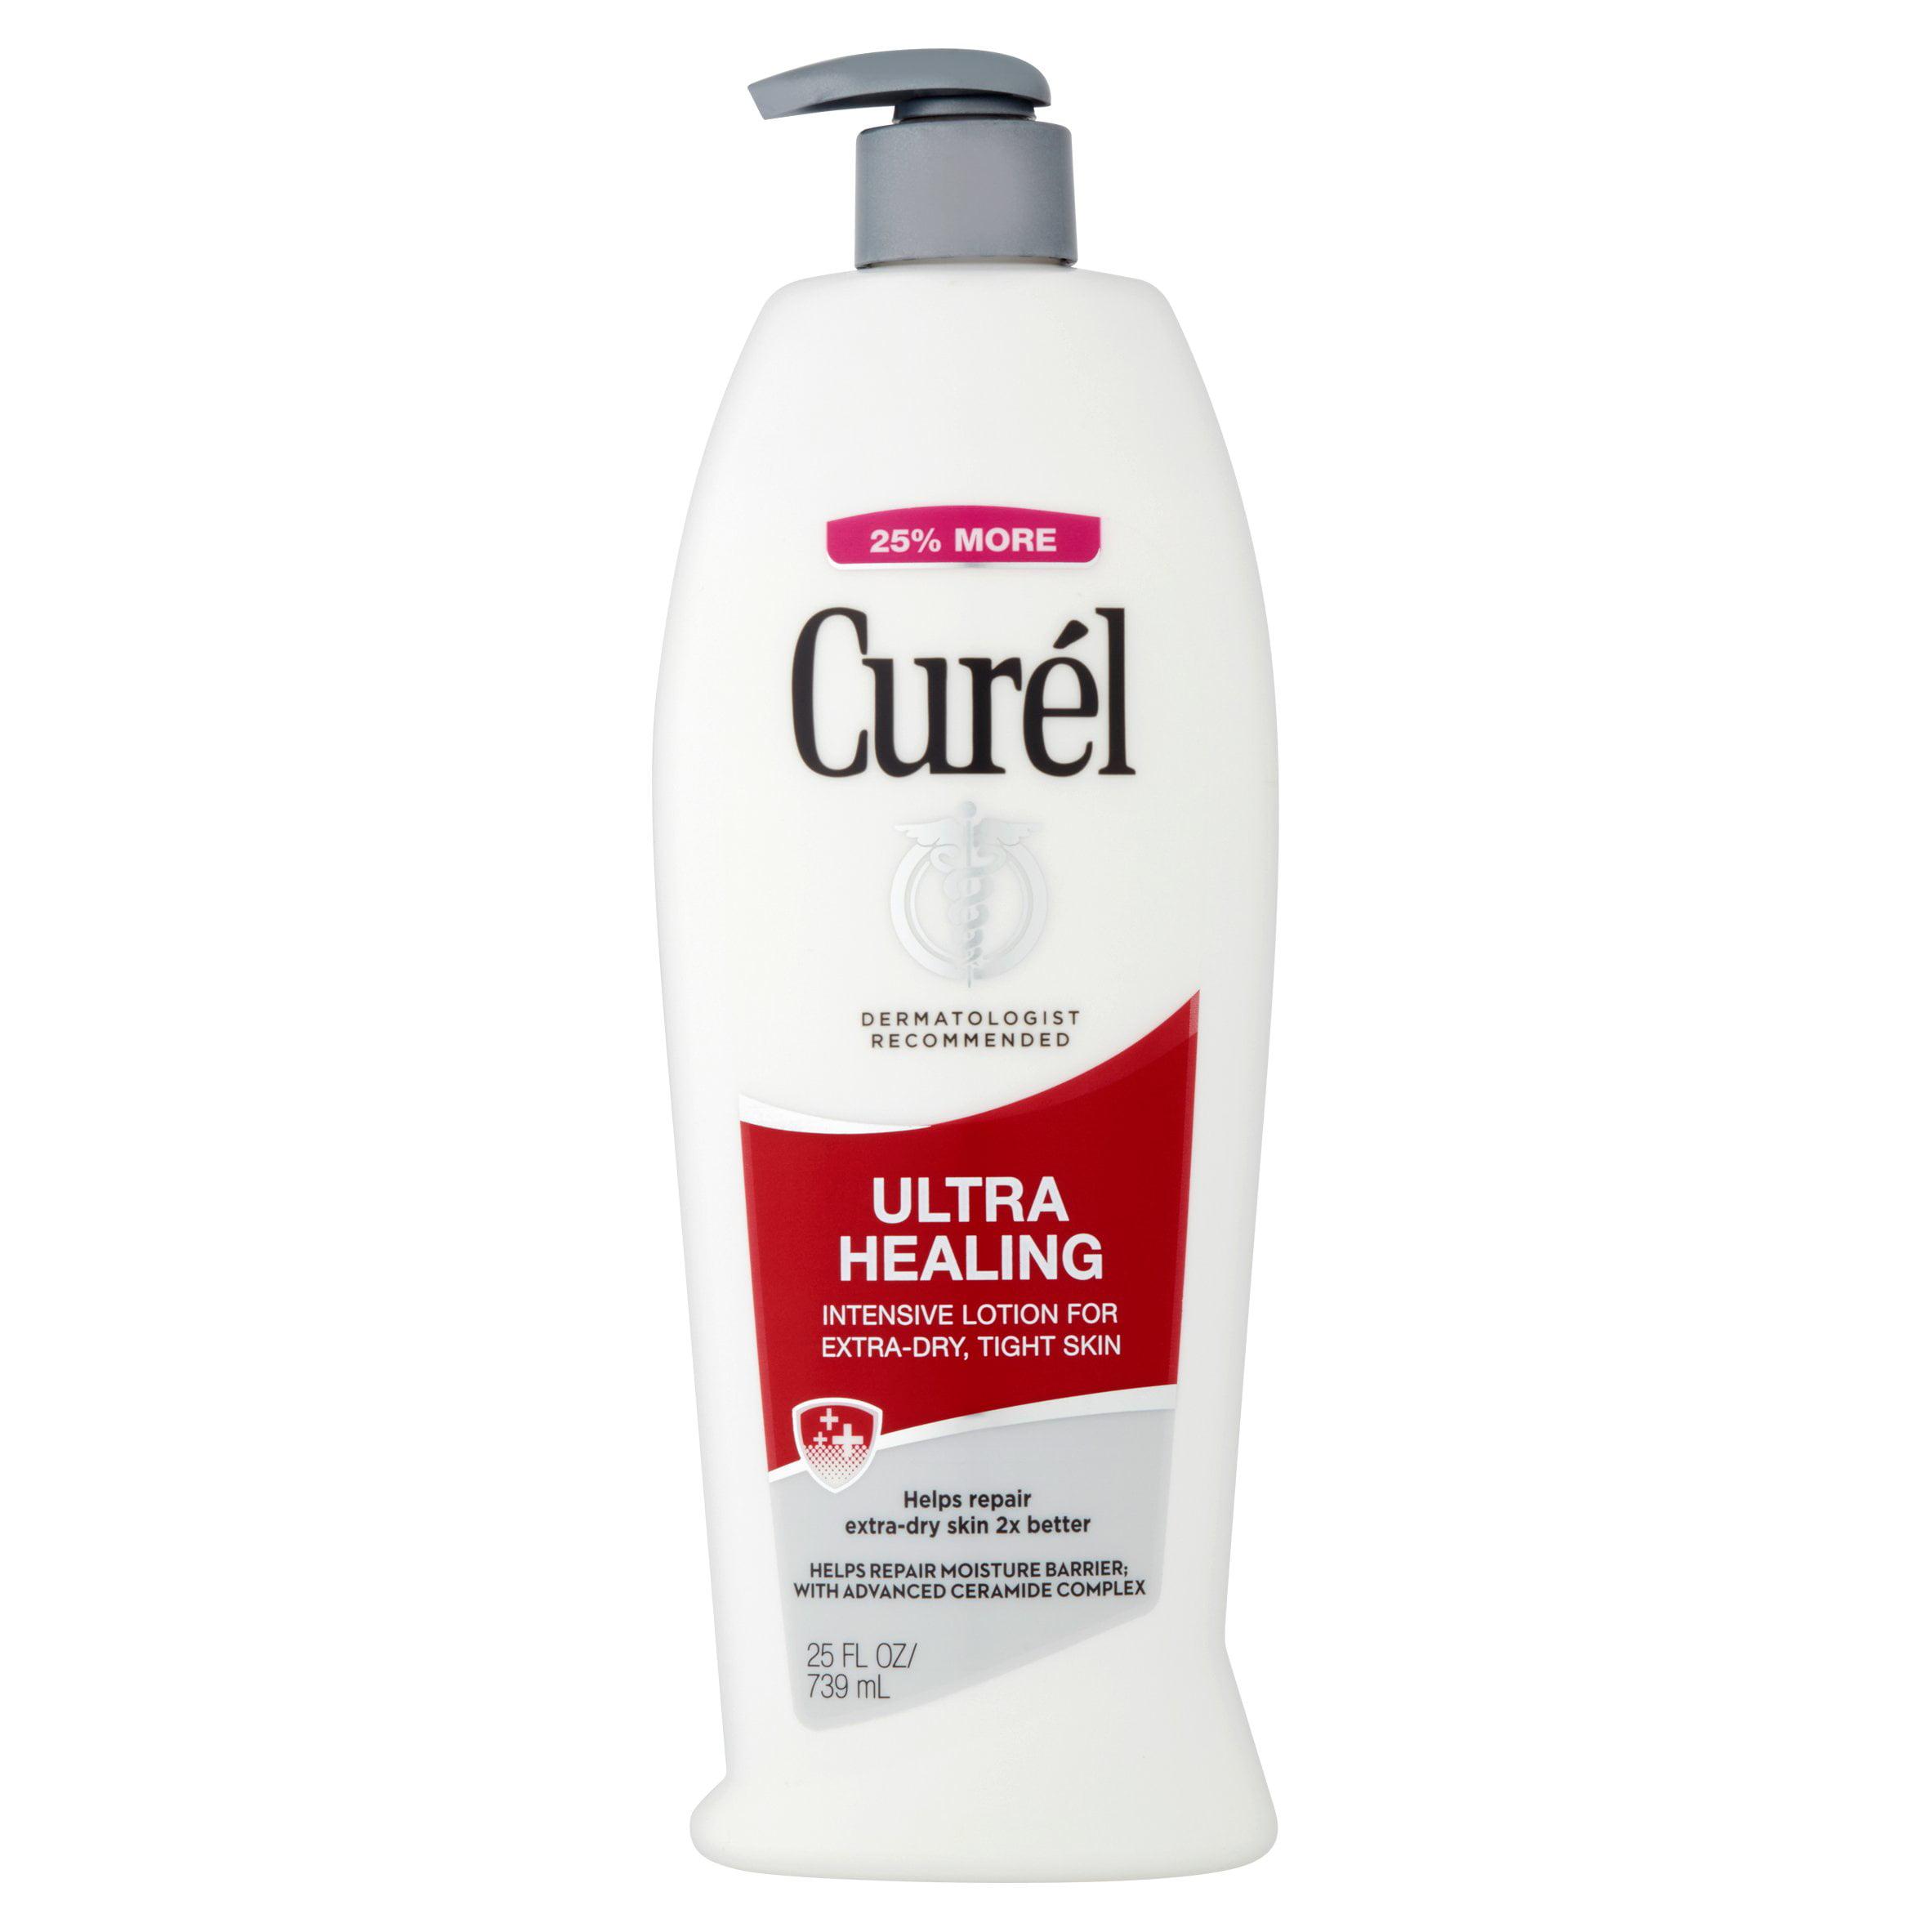 Curel Ultra Healing Intensive Lotion, 25 fl oz